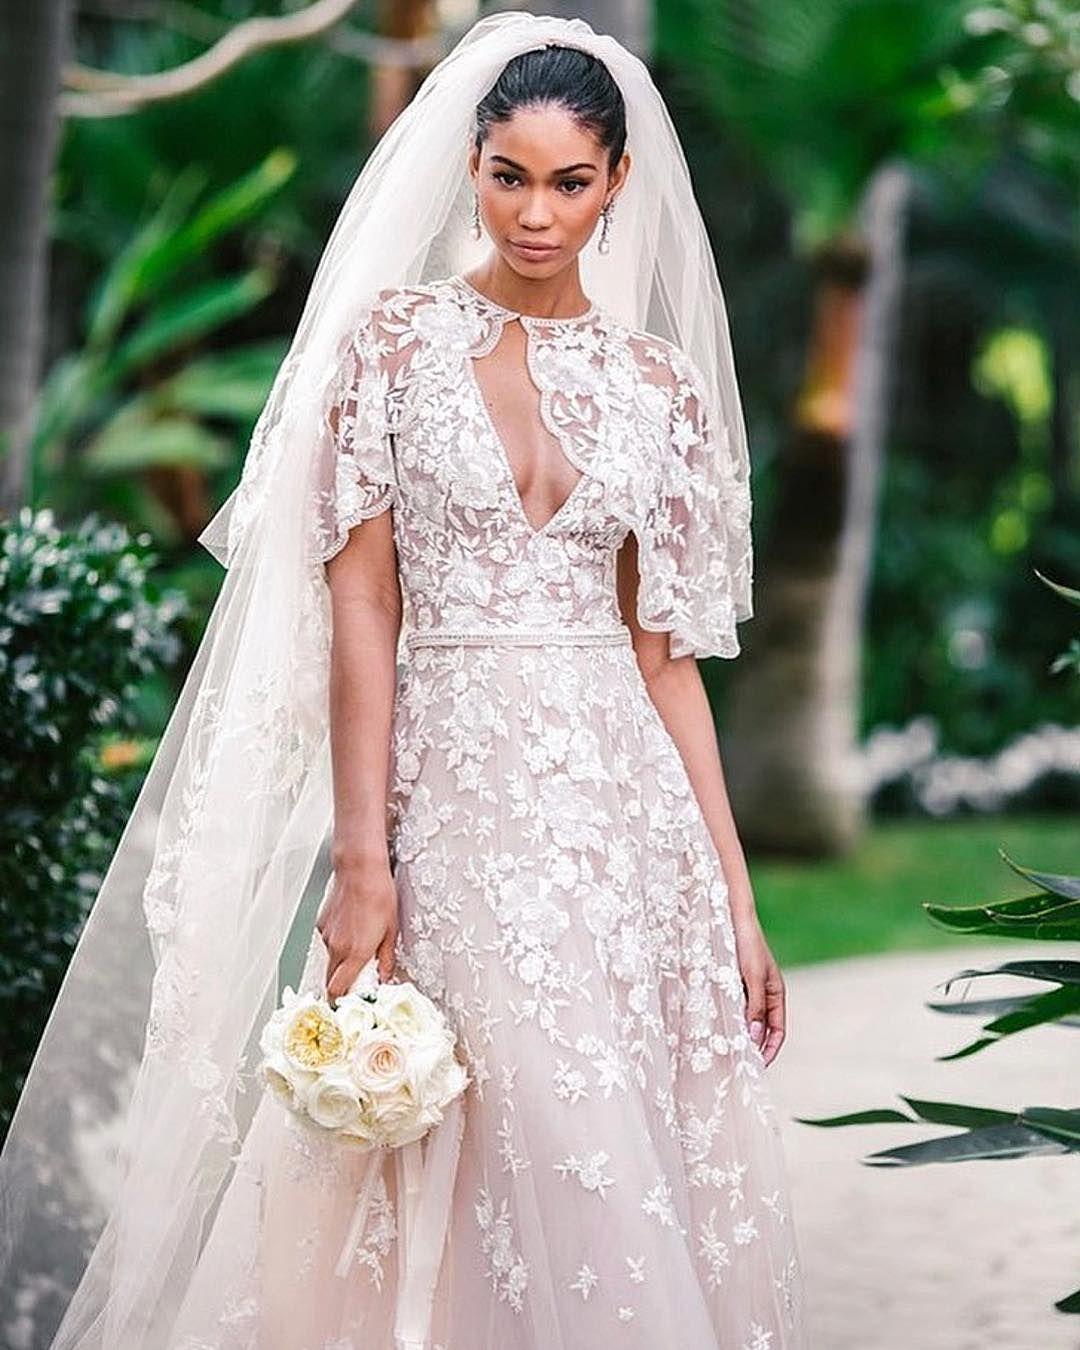 Pin On Beautiful Weddings Wedding Photographs